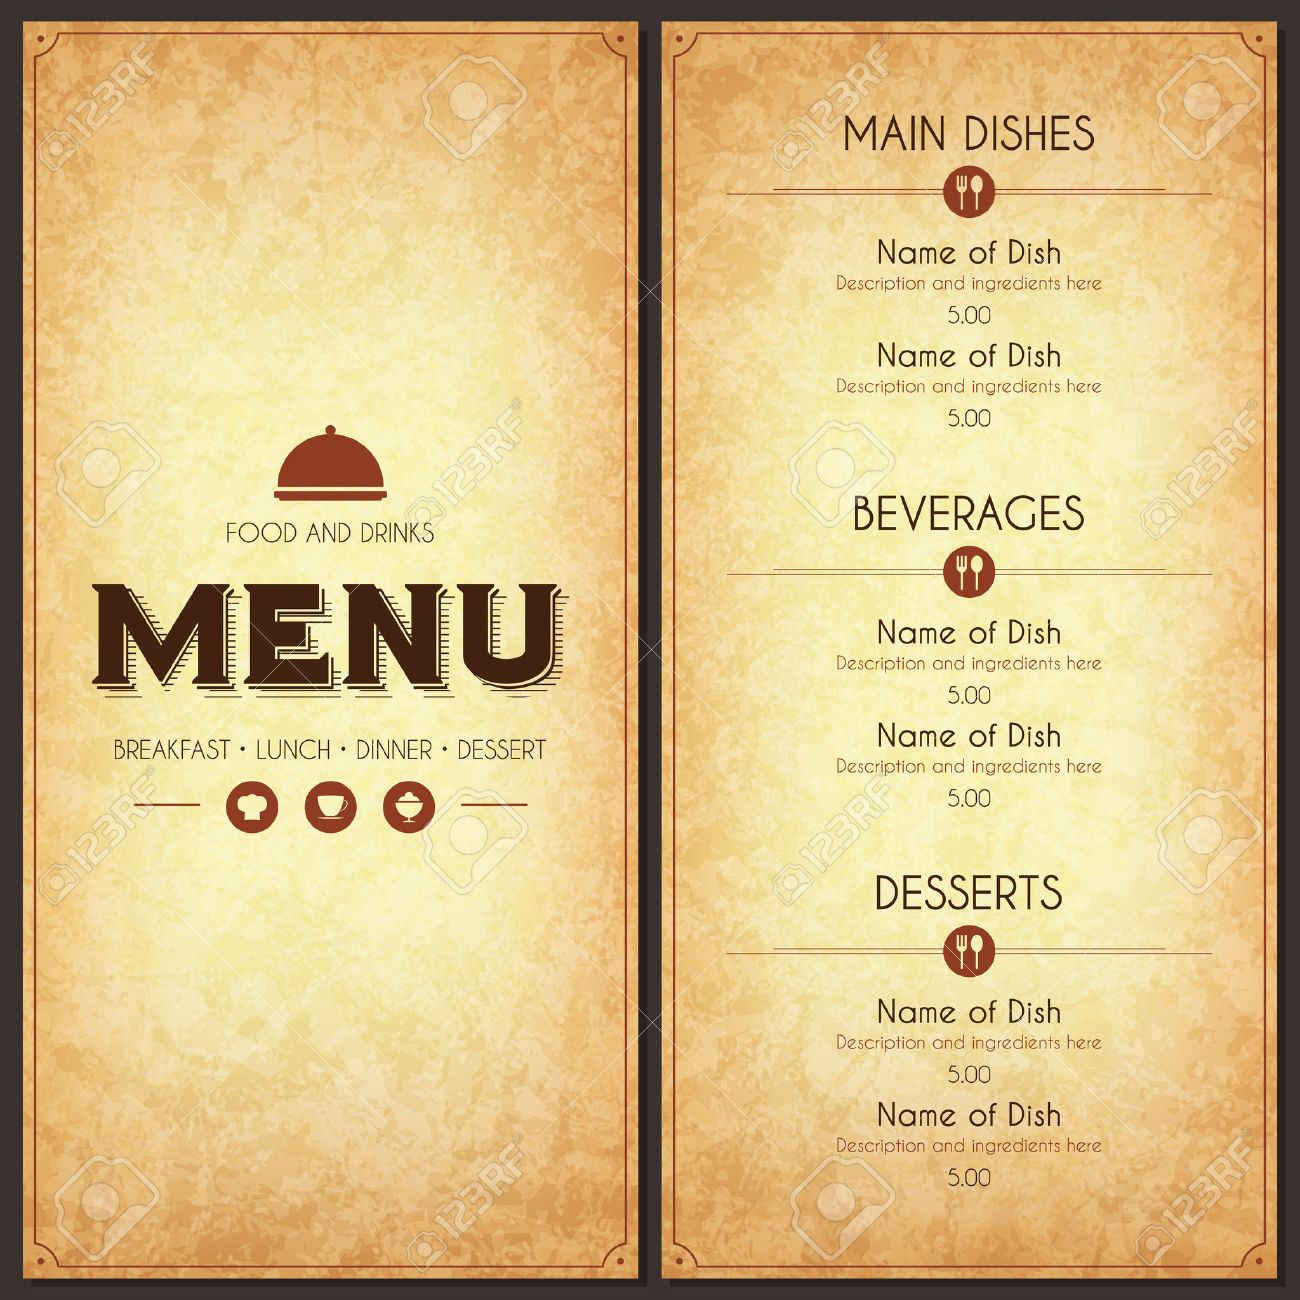 Restaurant Menu Design Royalty Free Cliparts Vectors And Stock Illustration Image 35168077